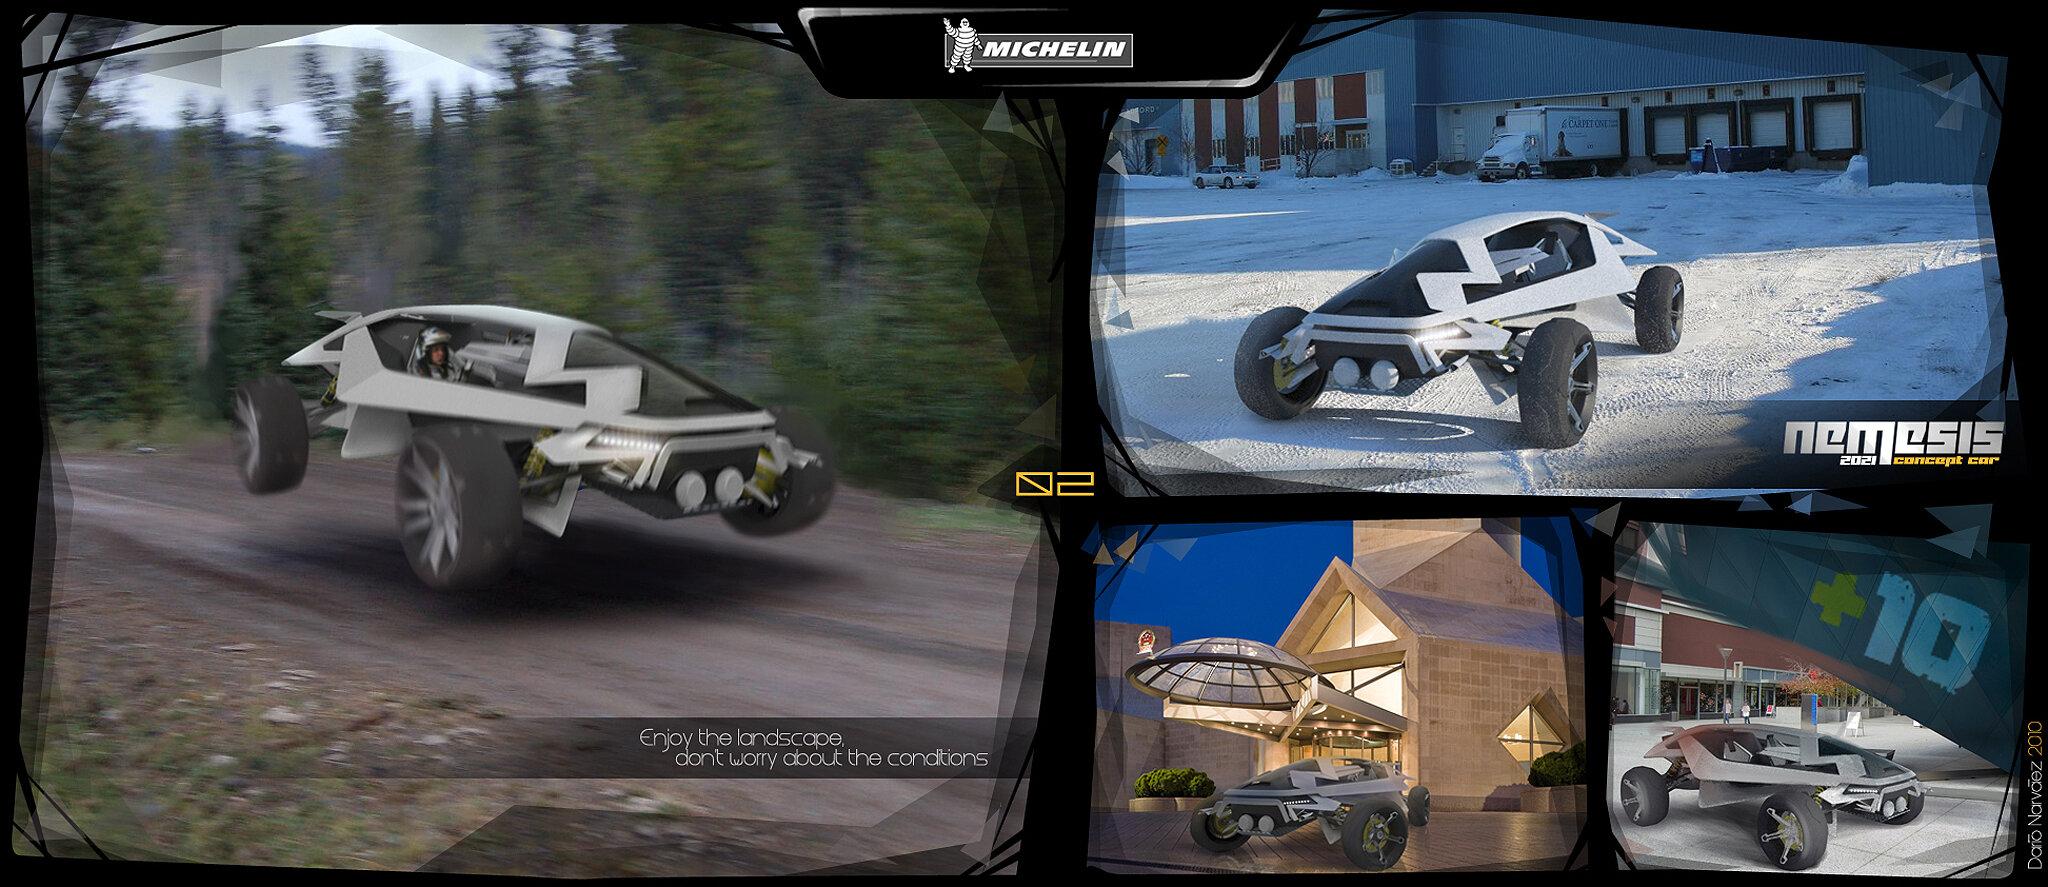 Nemesis_concept_car_final_03_source.jpg